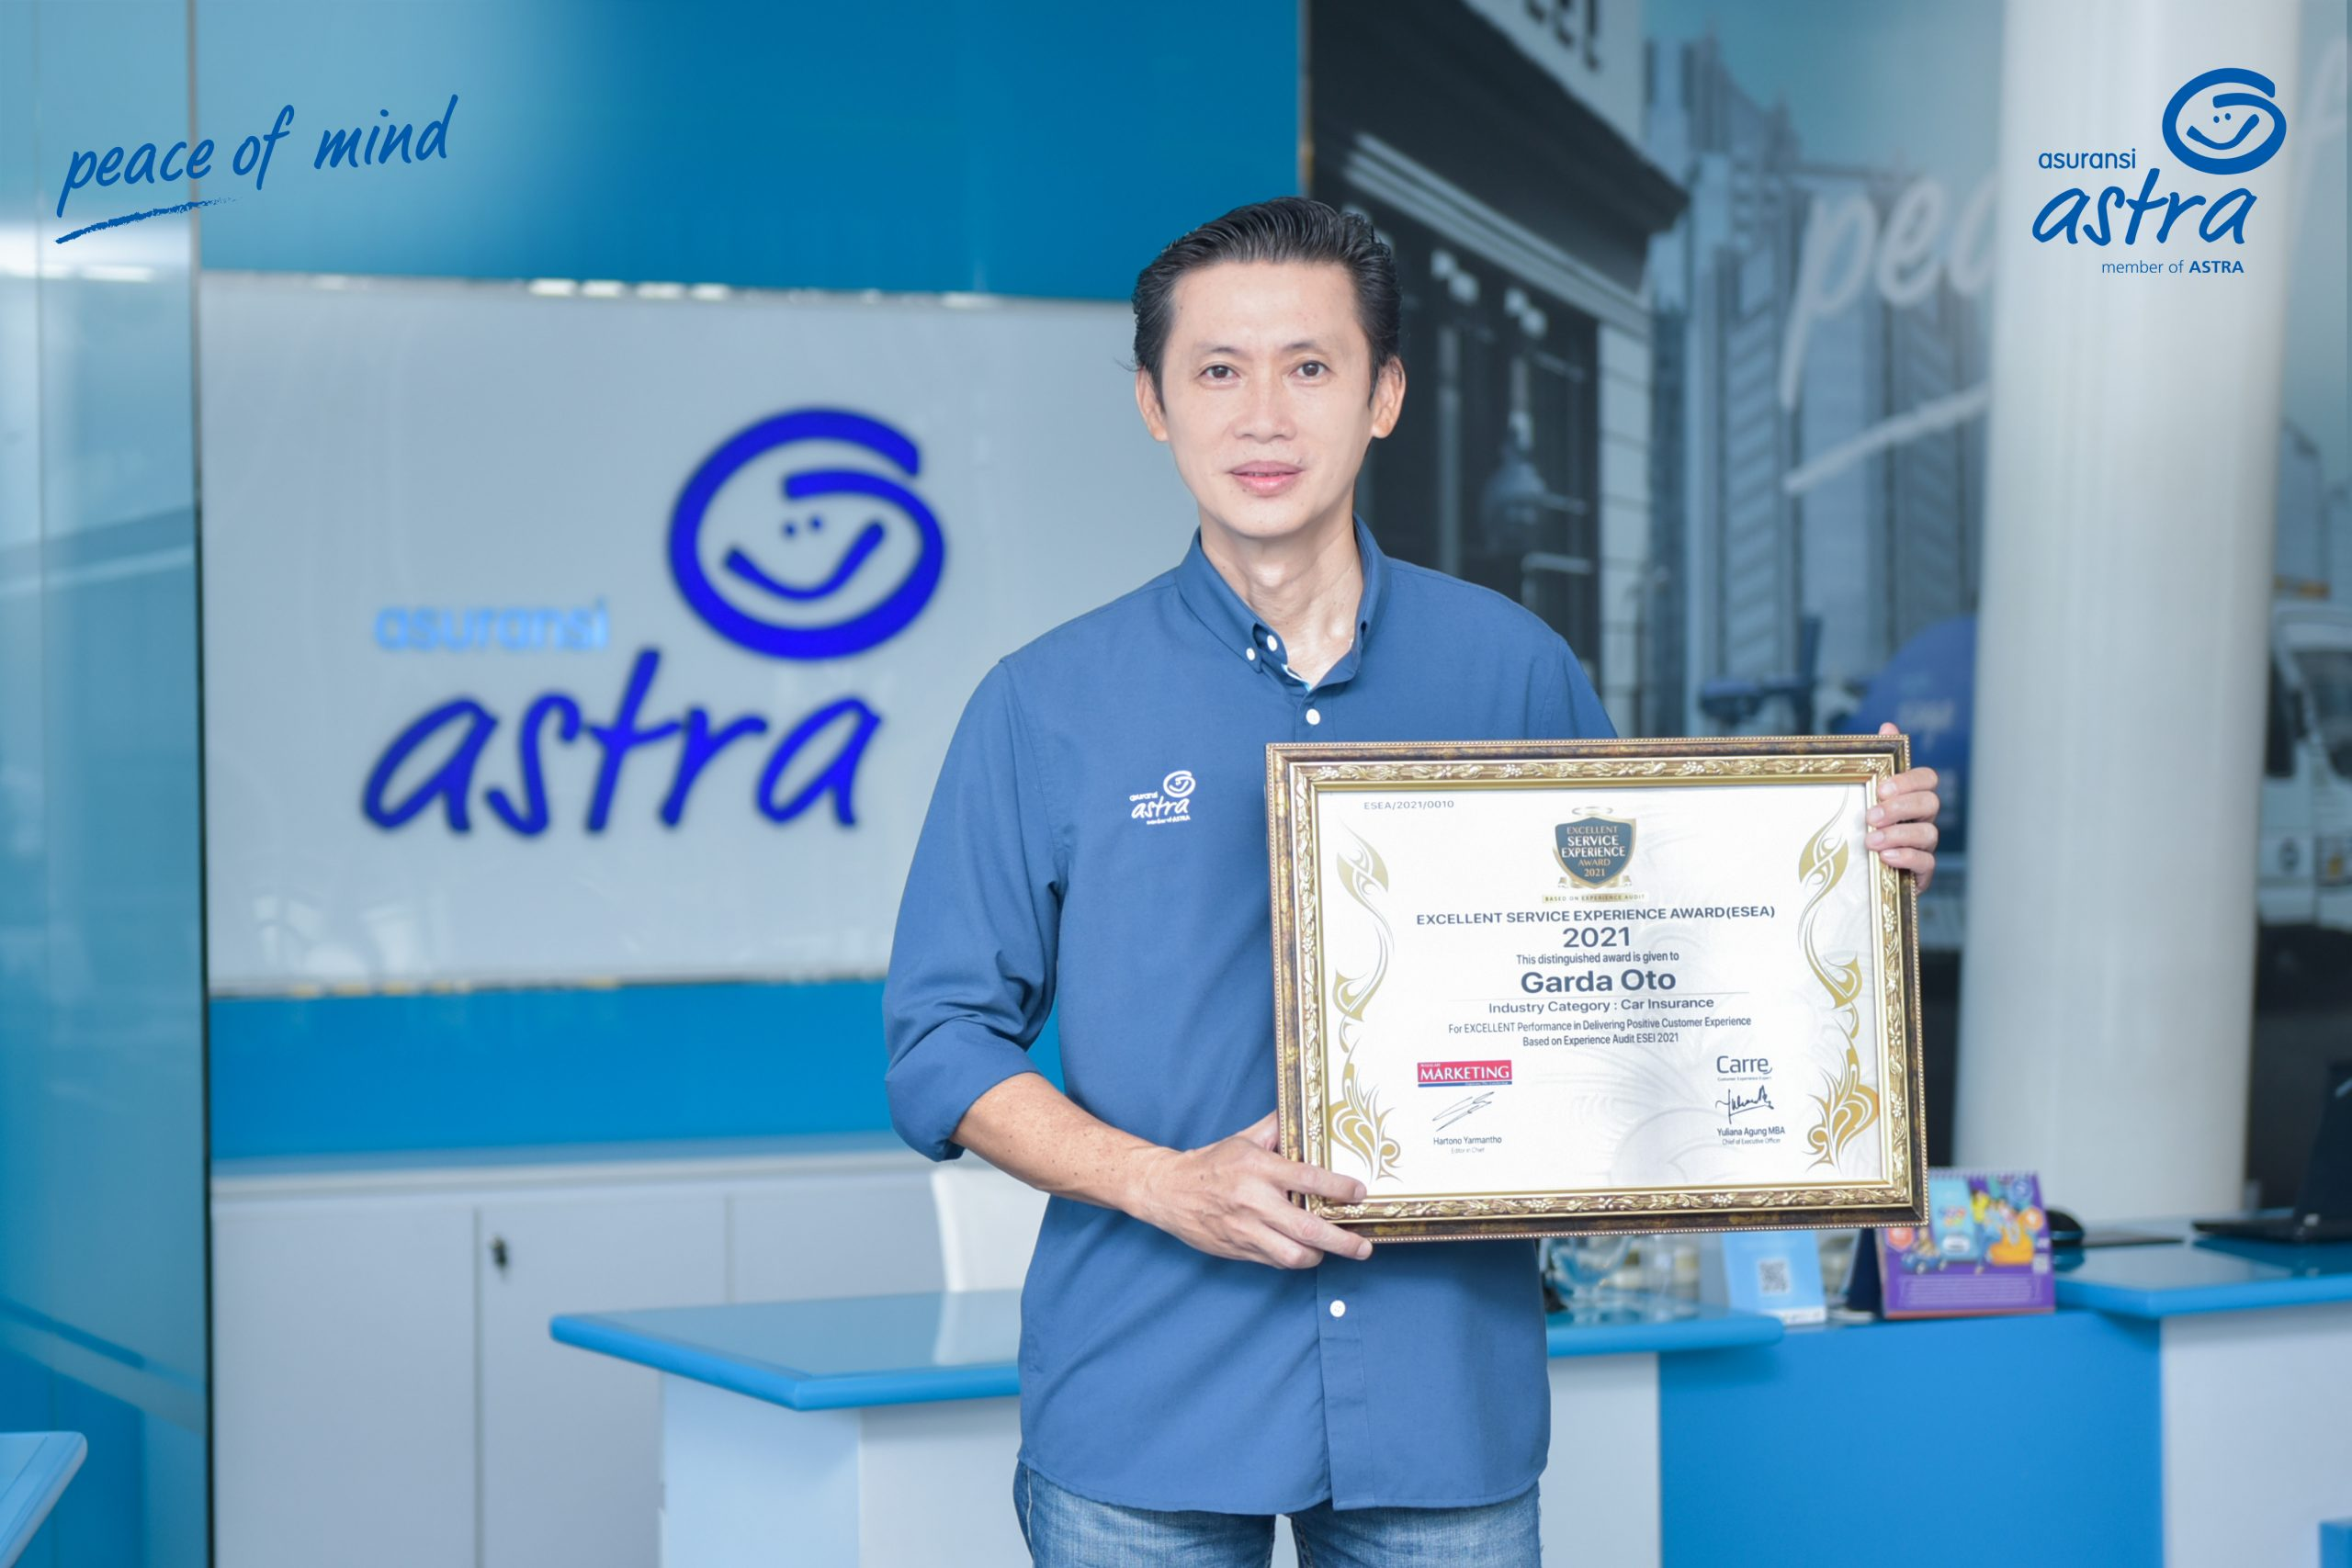 Adrianto Tjia, SVP Business Management menerima penghargaan Excellent Service Experience Award (ESEA) dari Majalah Marketing